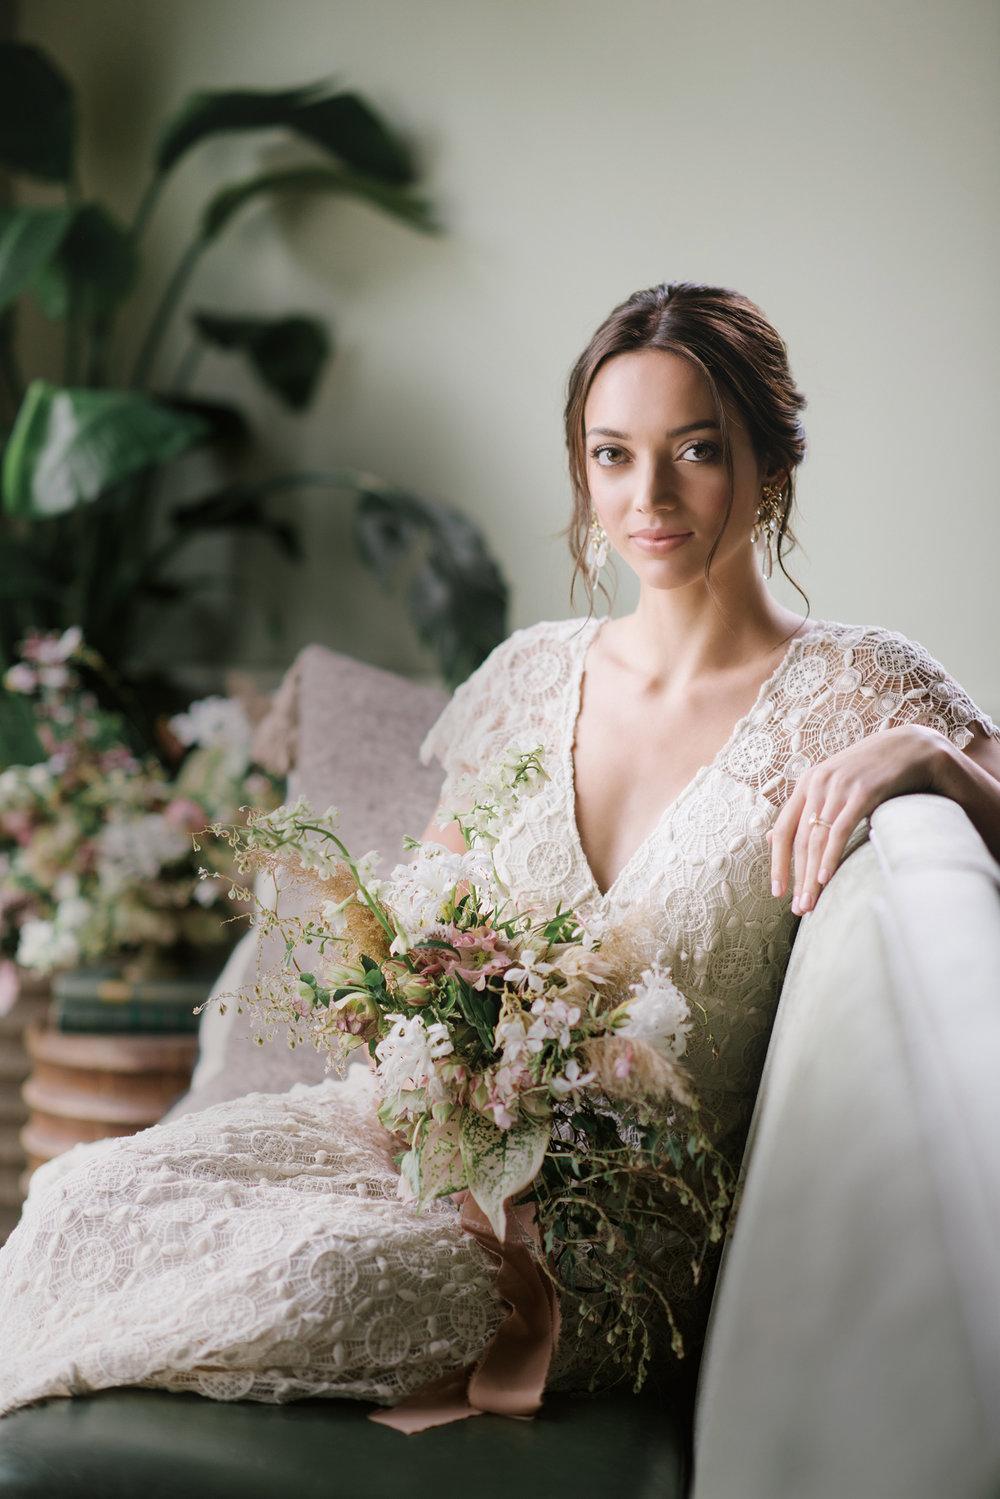 hsl_slpc_bride_groom_2017_0286.jpg